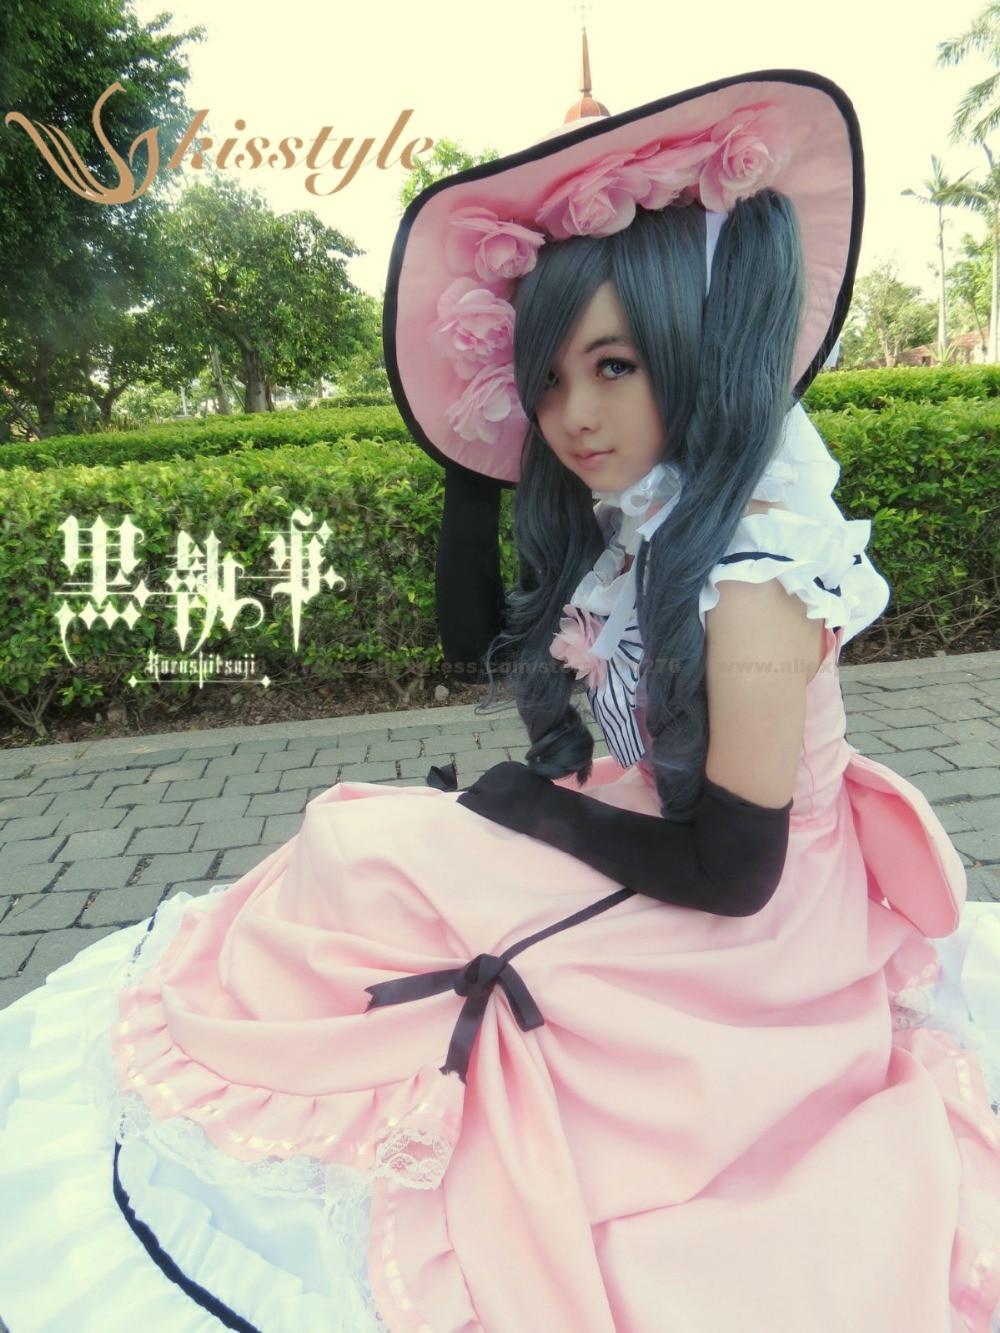 Kisstyle Fashion Black Butler Kuroshitsuji Ciel Cosplay Costume Dress Lolita Custom Made, Any Size